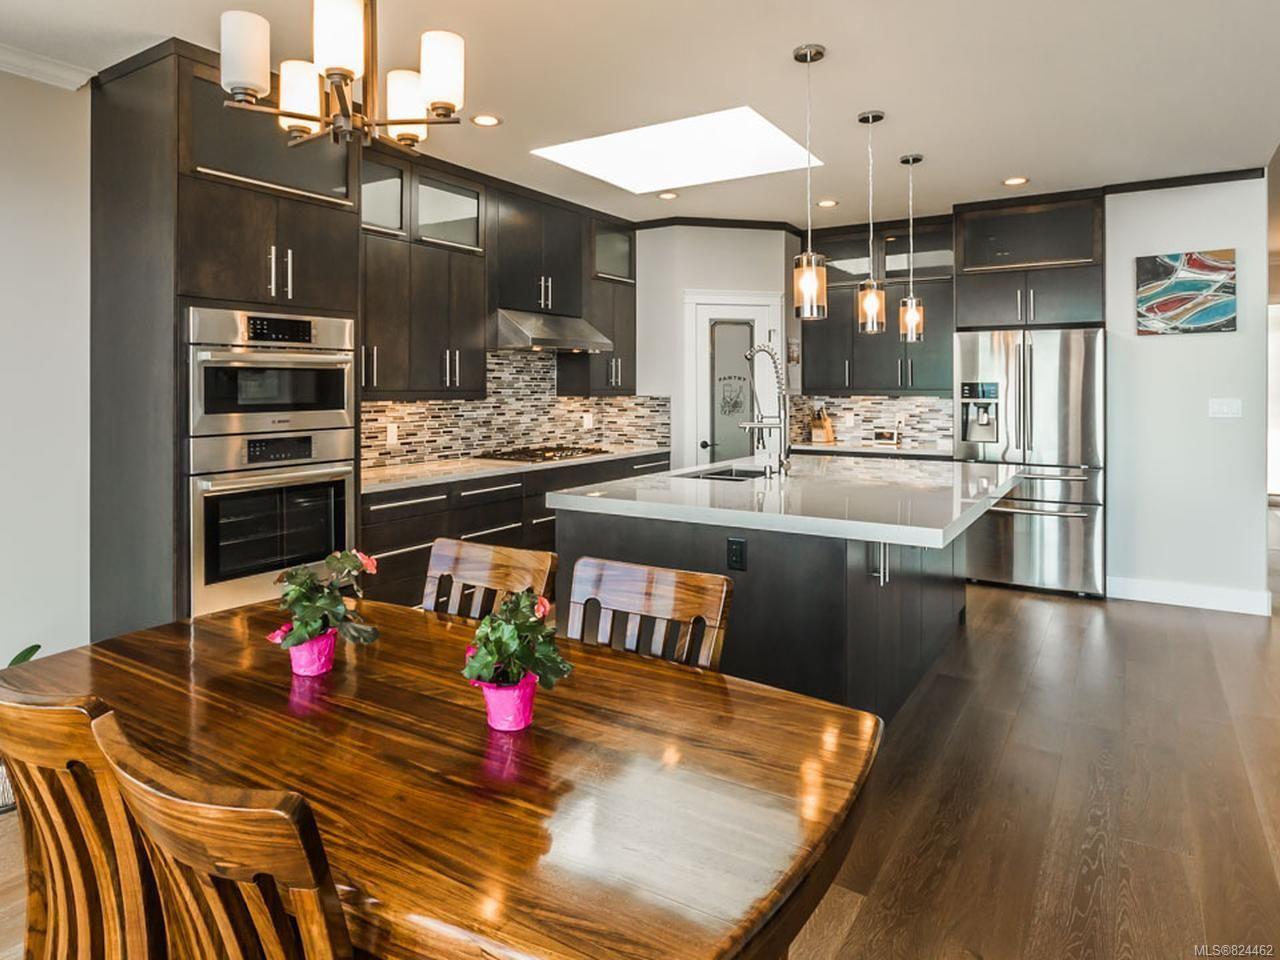 Photo 8: Photos: 3864 Gulfview Dr in NANAIMO: Na North Nanaimo House for sale (Nanaimo)  : MLS®# 824462